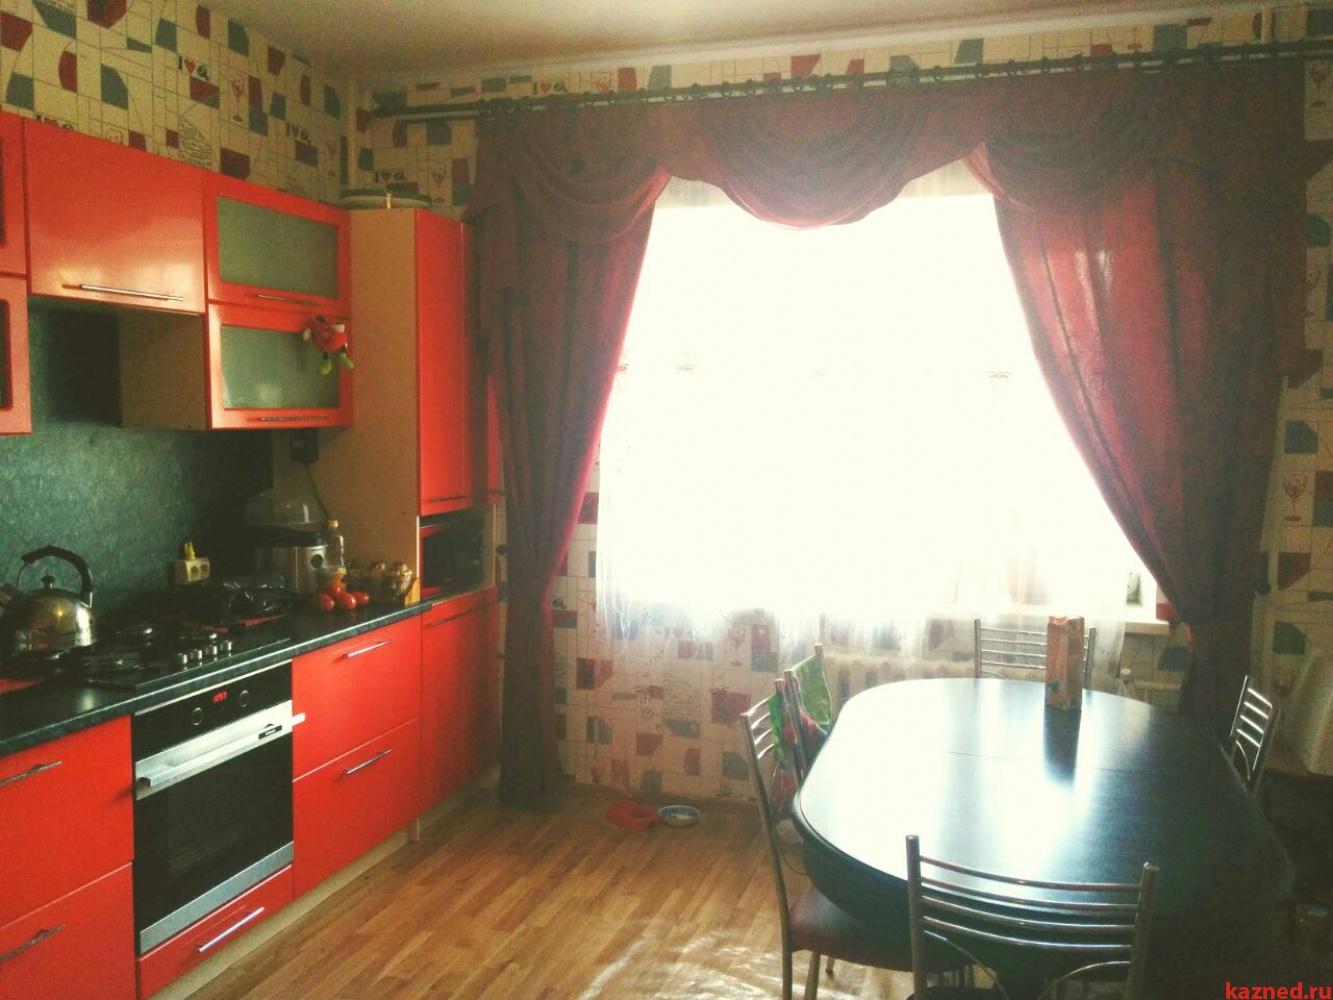 Продажа 3-к квартиры Гарифа Ахунова, 18, 88 м²  (миниатюра №9)